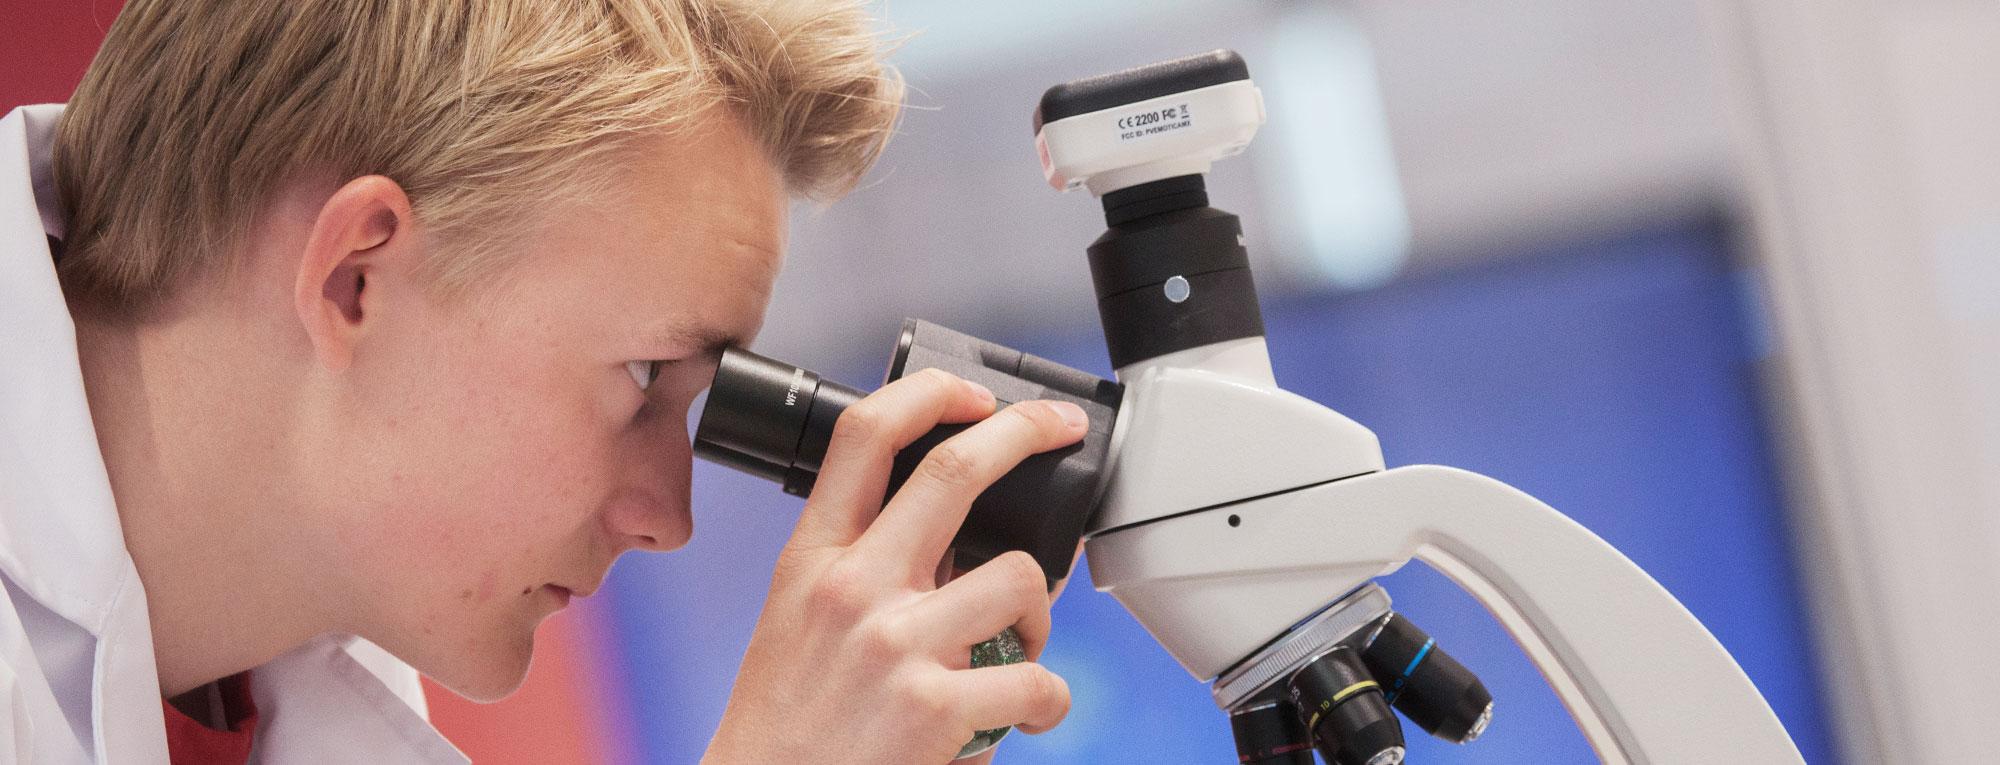 topp-mikroskop.jpg